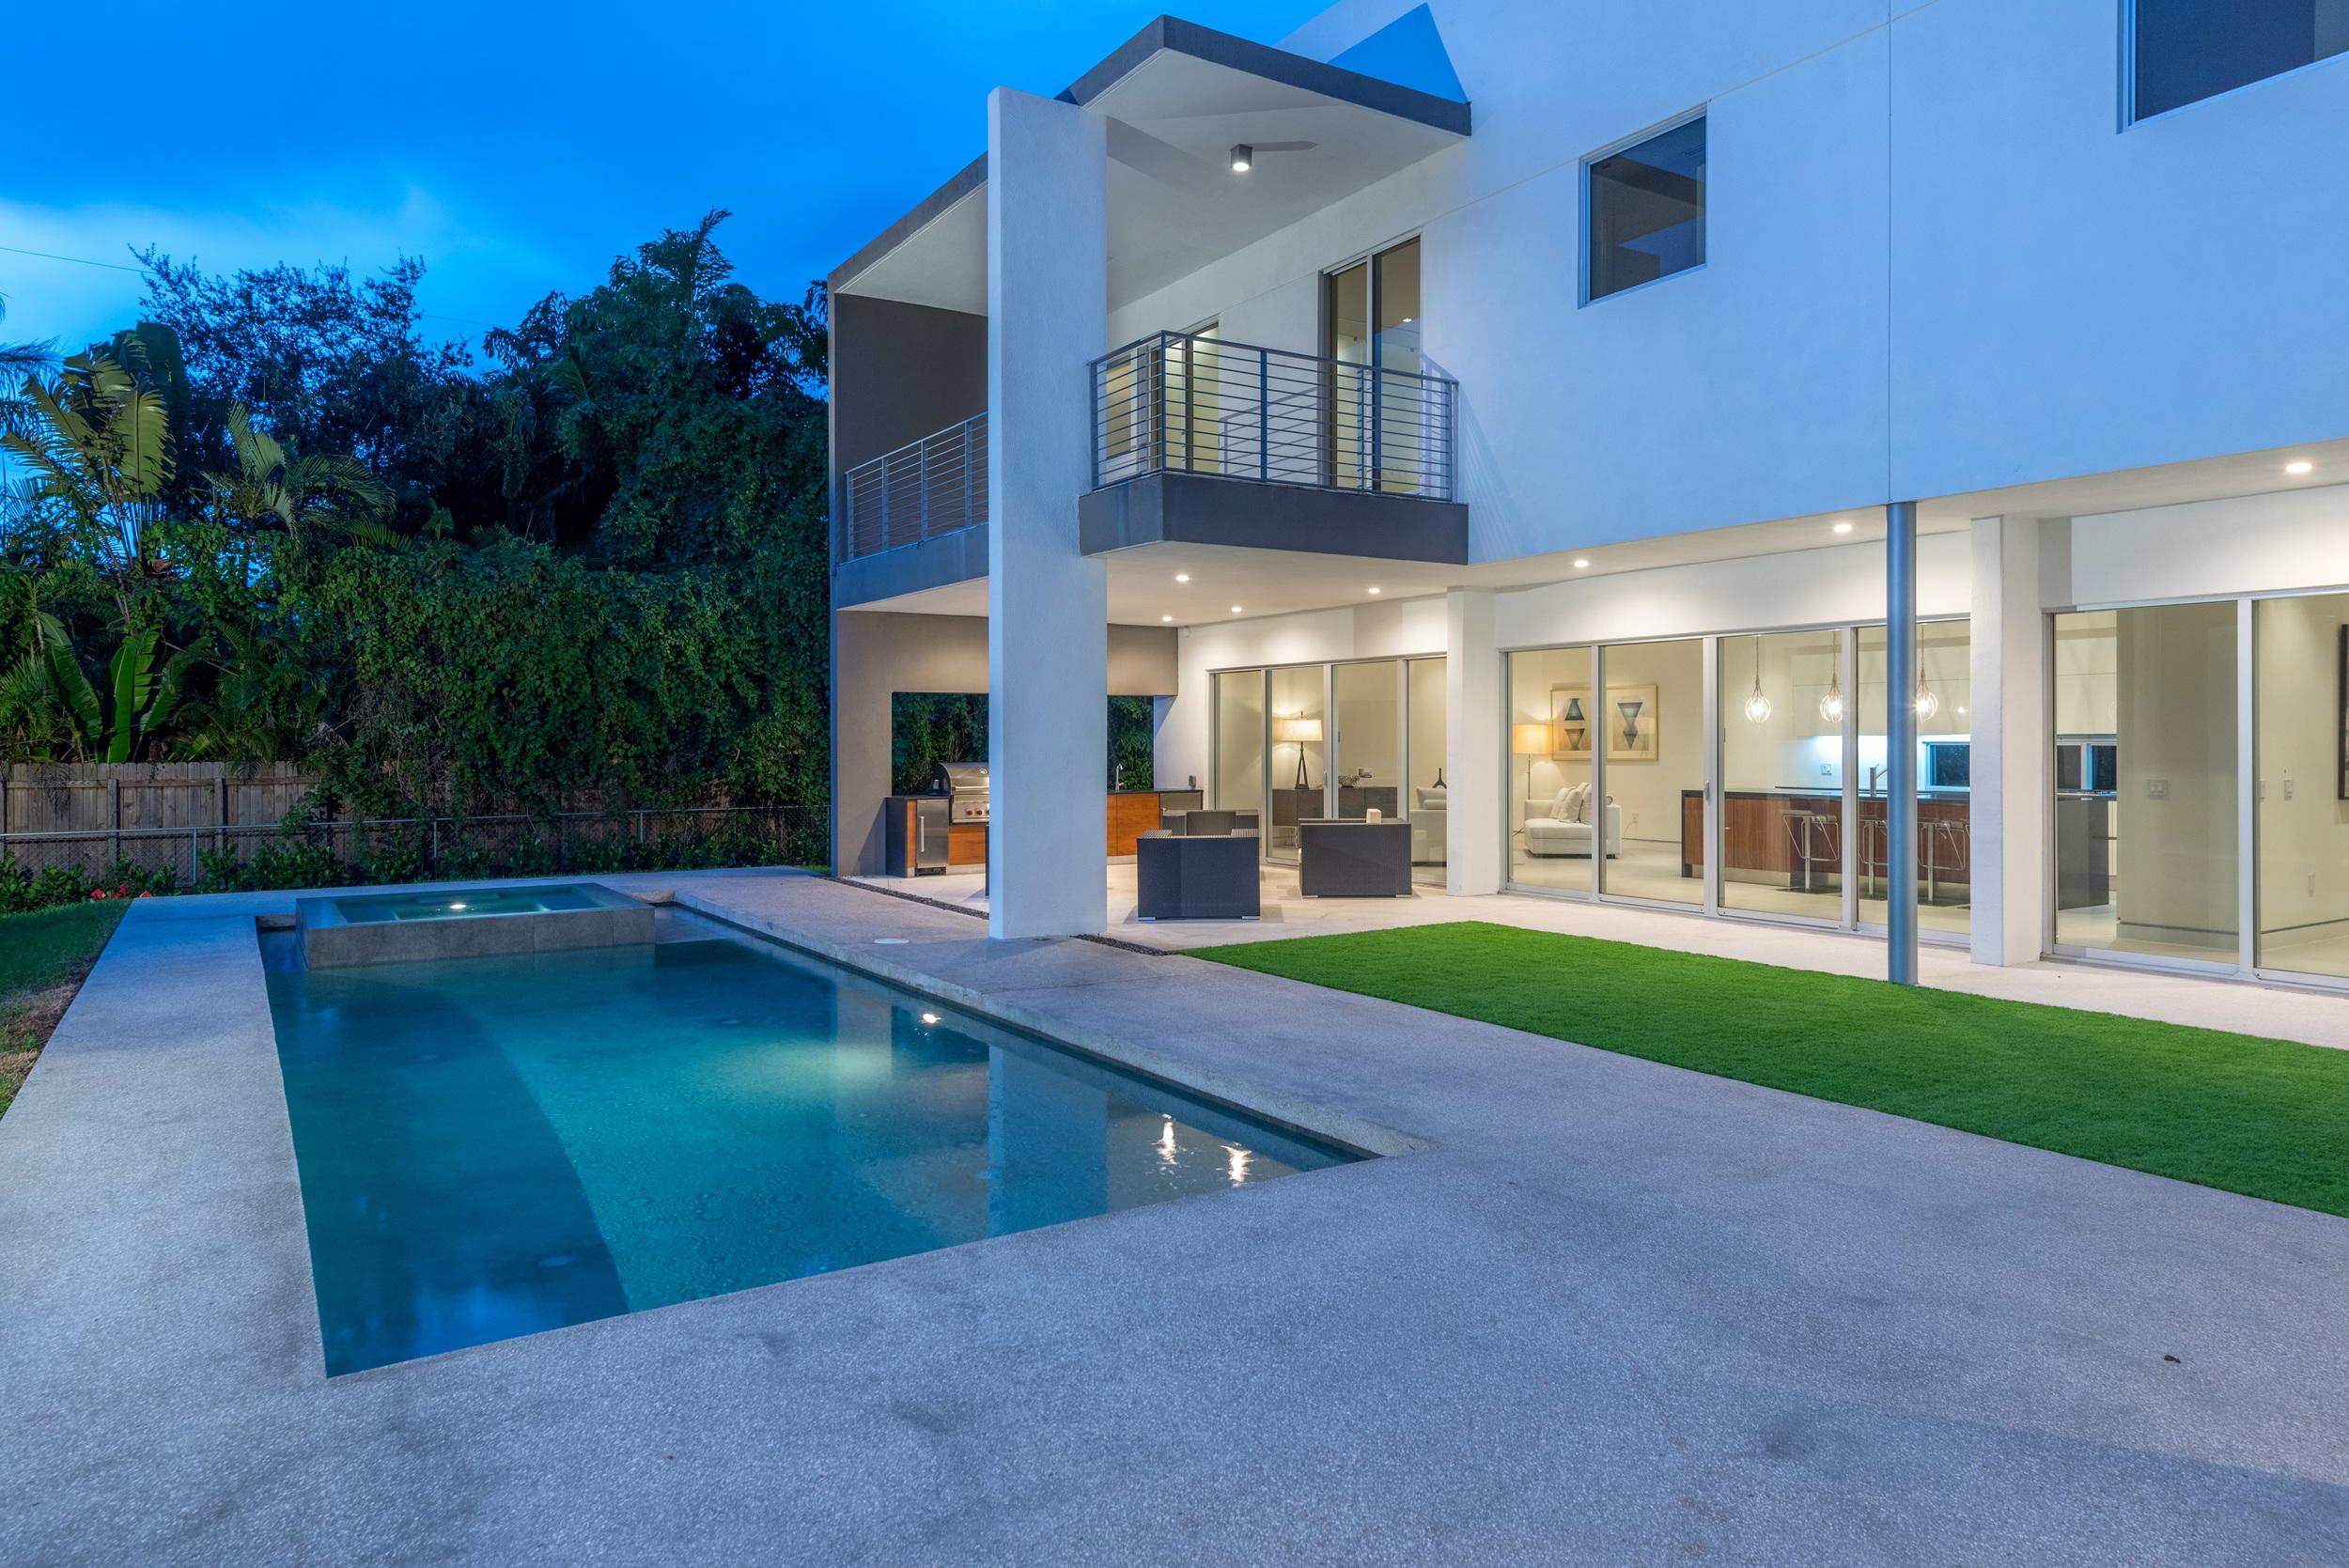 The Setting Homes Plum House Miami Florida Exterior Pool Night TARIS Real Estate